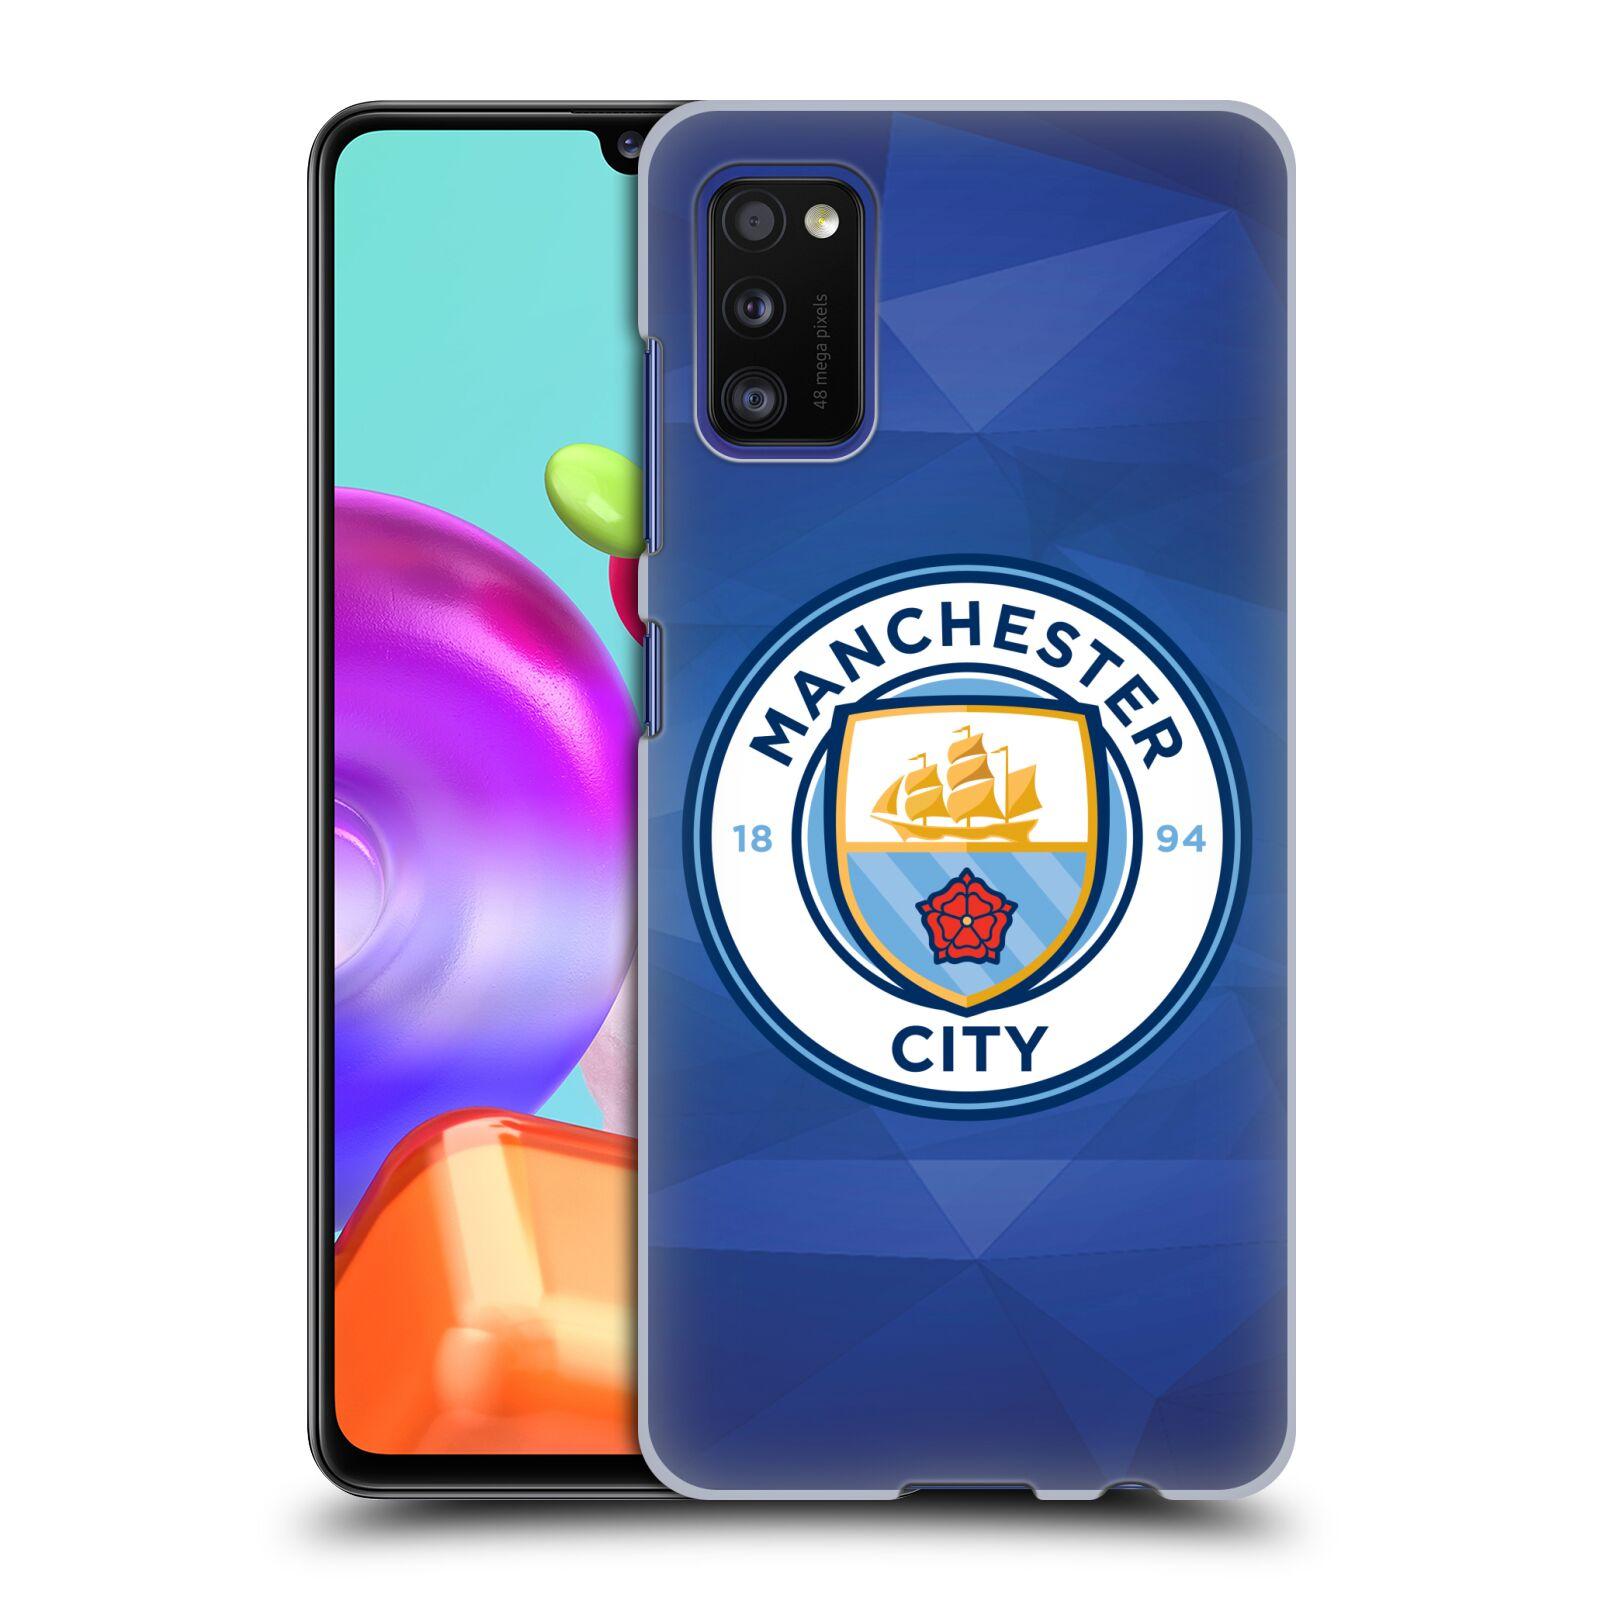 Plastové pouzdro na mobil Samsung Galaxy A41 - Head Case - Manchester City FC - Modré nové logo